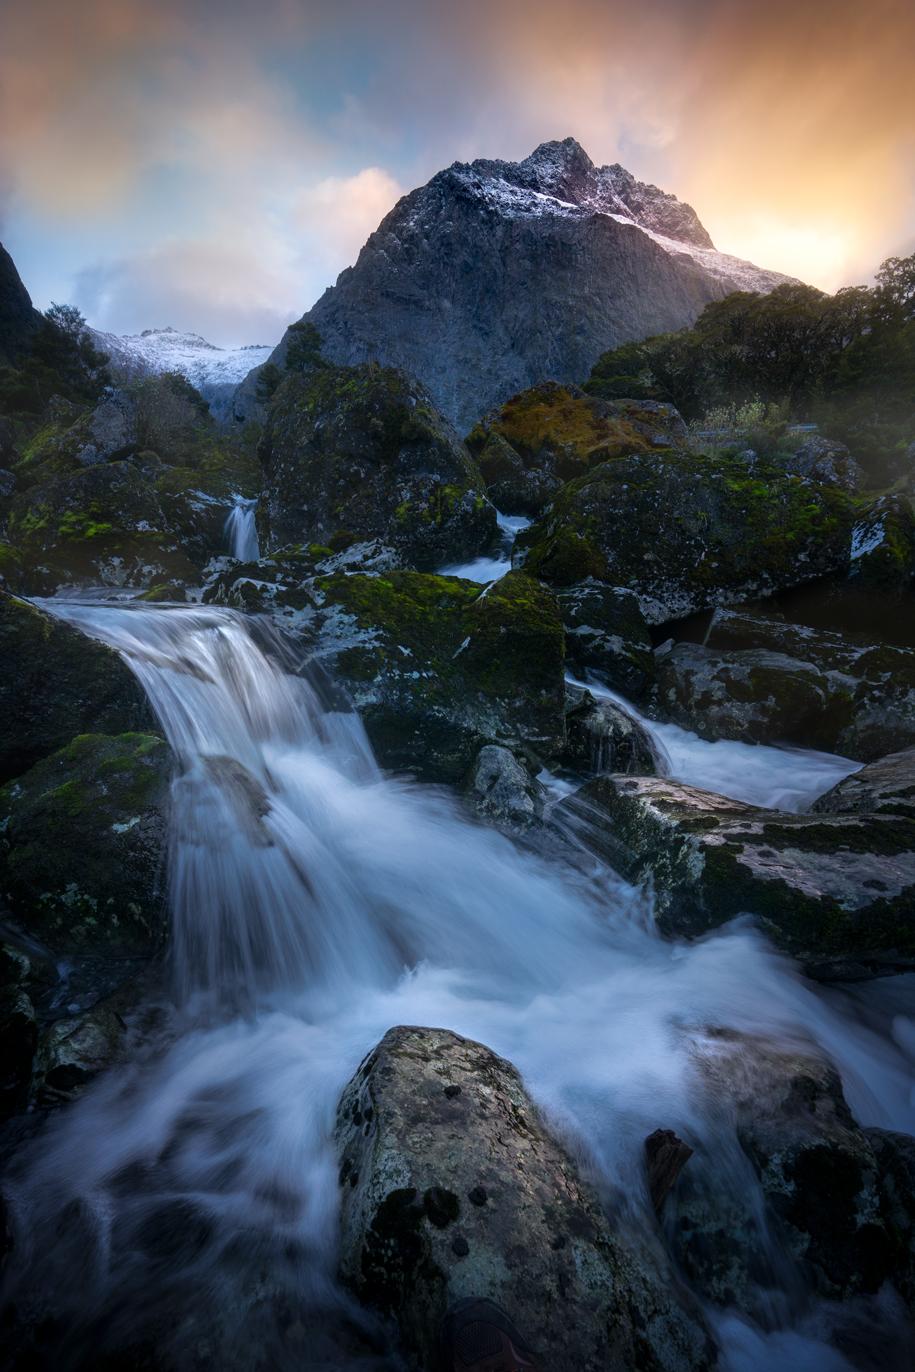 Mt Talbot, Fiordland New Zealand